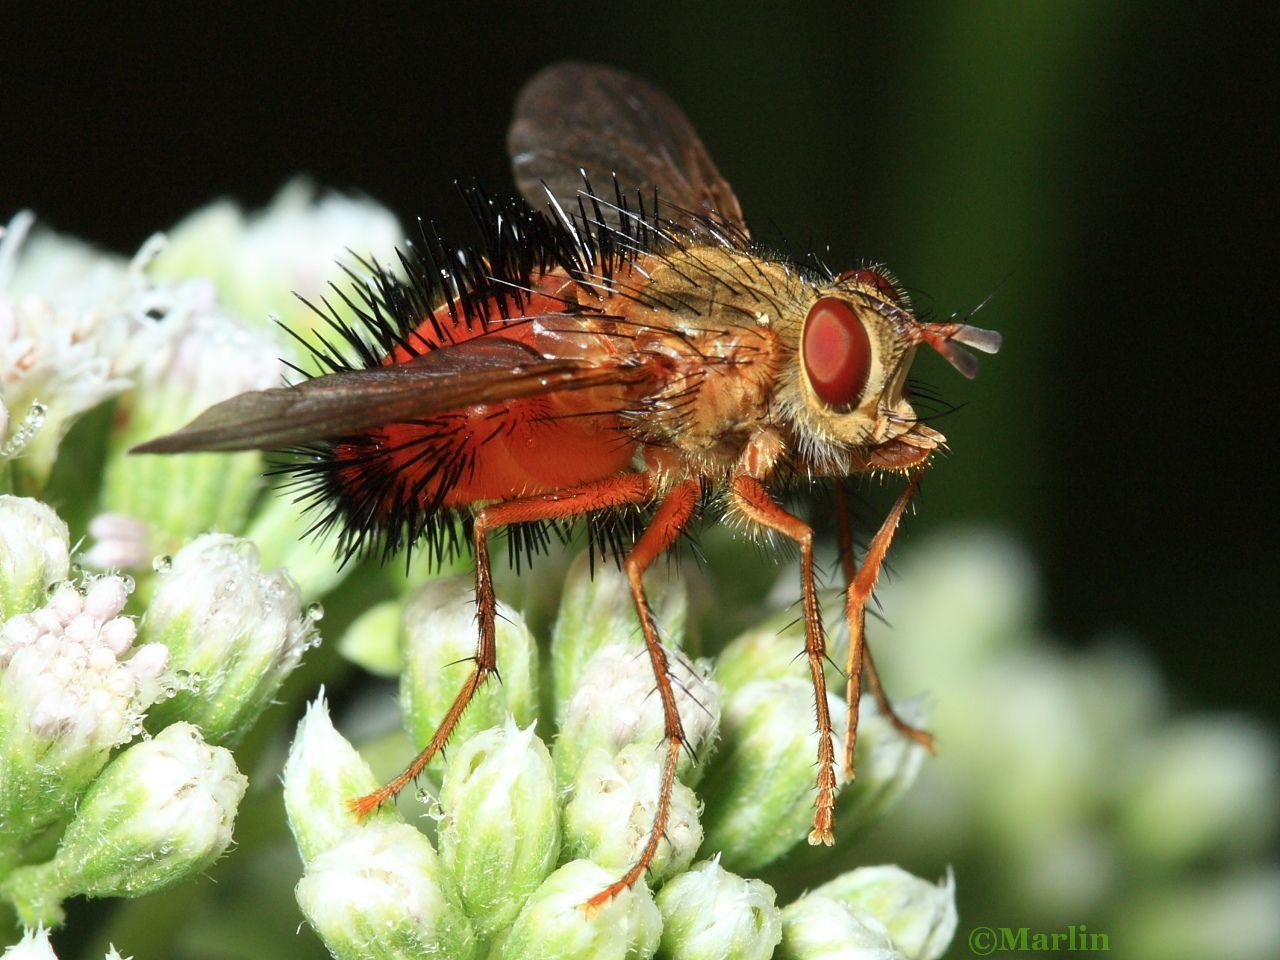 Tachinid Fly, Hystricia abrupta